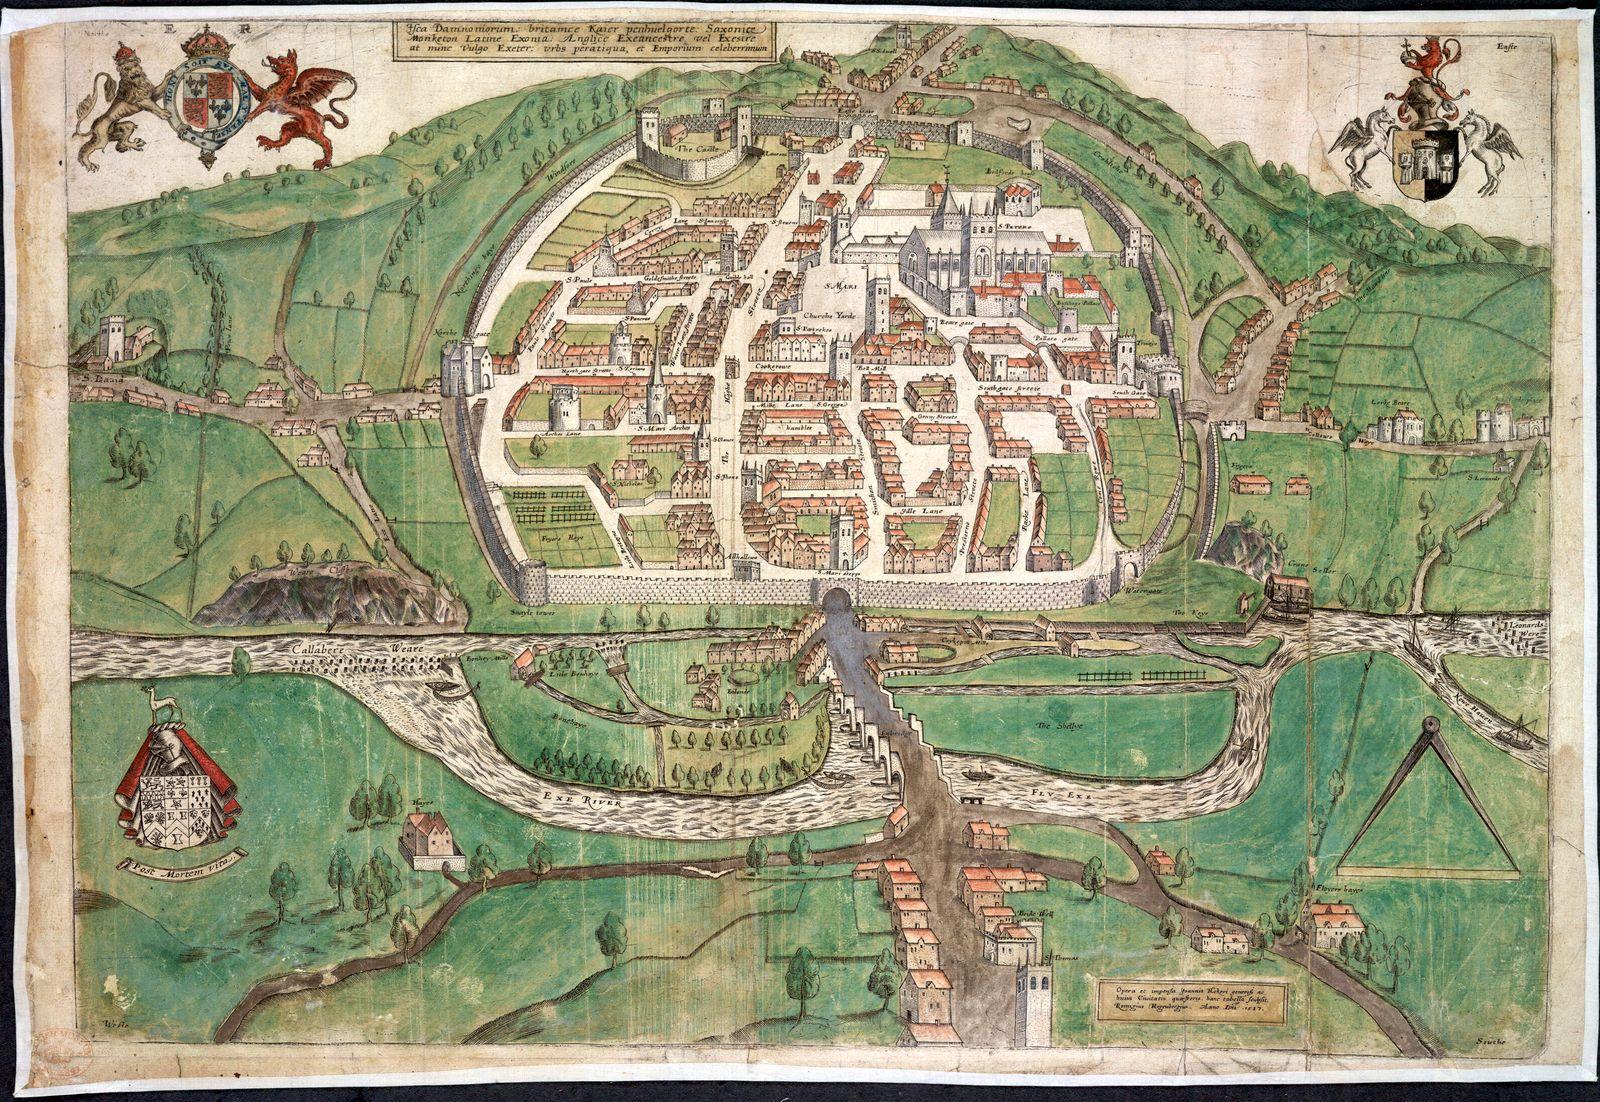 ANGLETERRE XVIeme s. Carte d Exeter en Angleterre realisee par Remigius Hogenberg vers 1587 (16e, XVIe s.) Credit : Coll